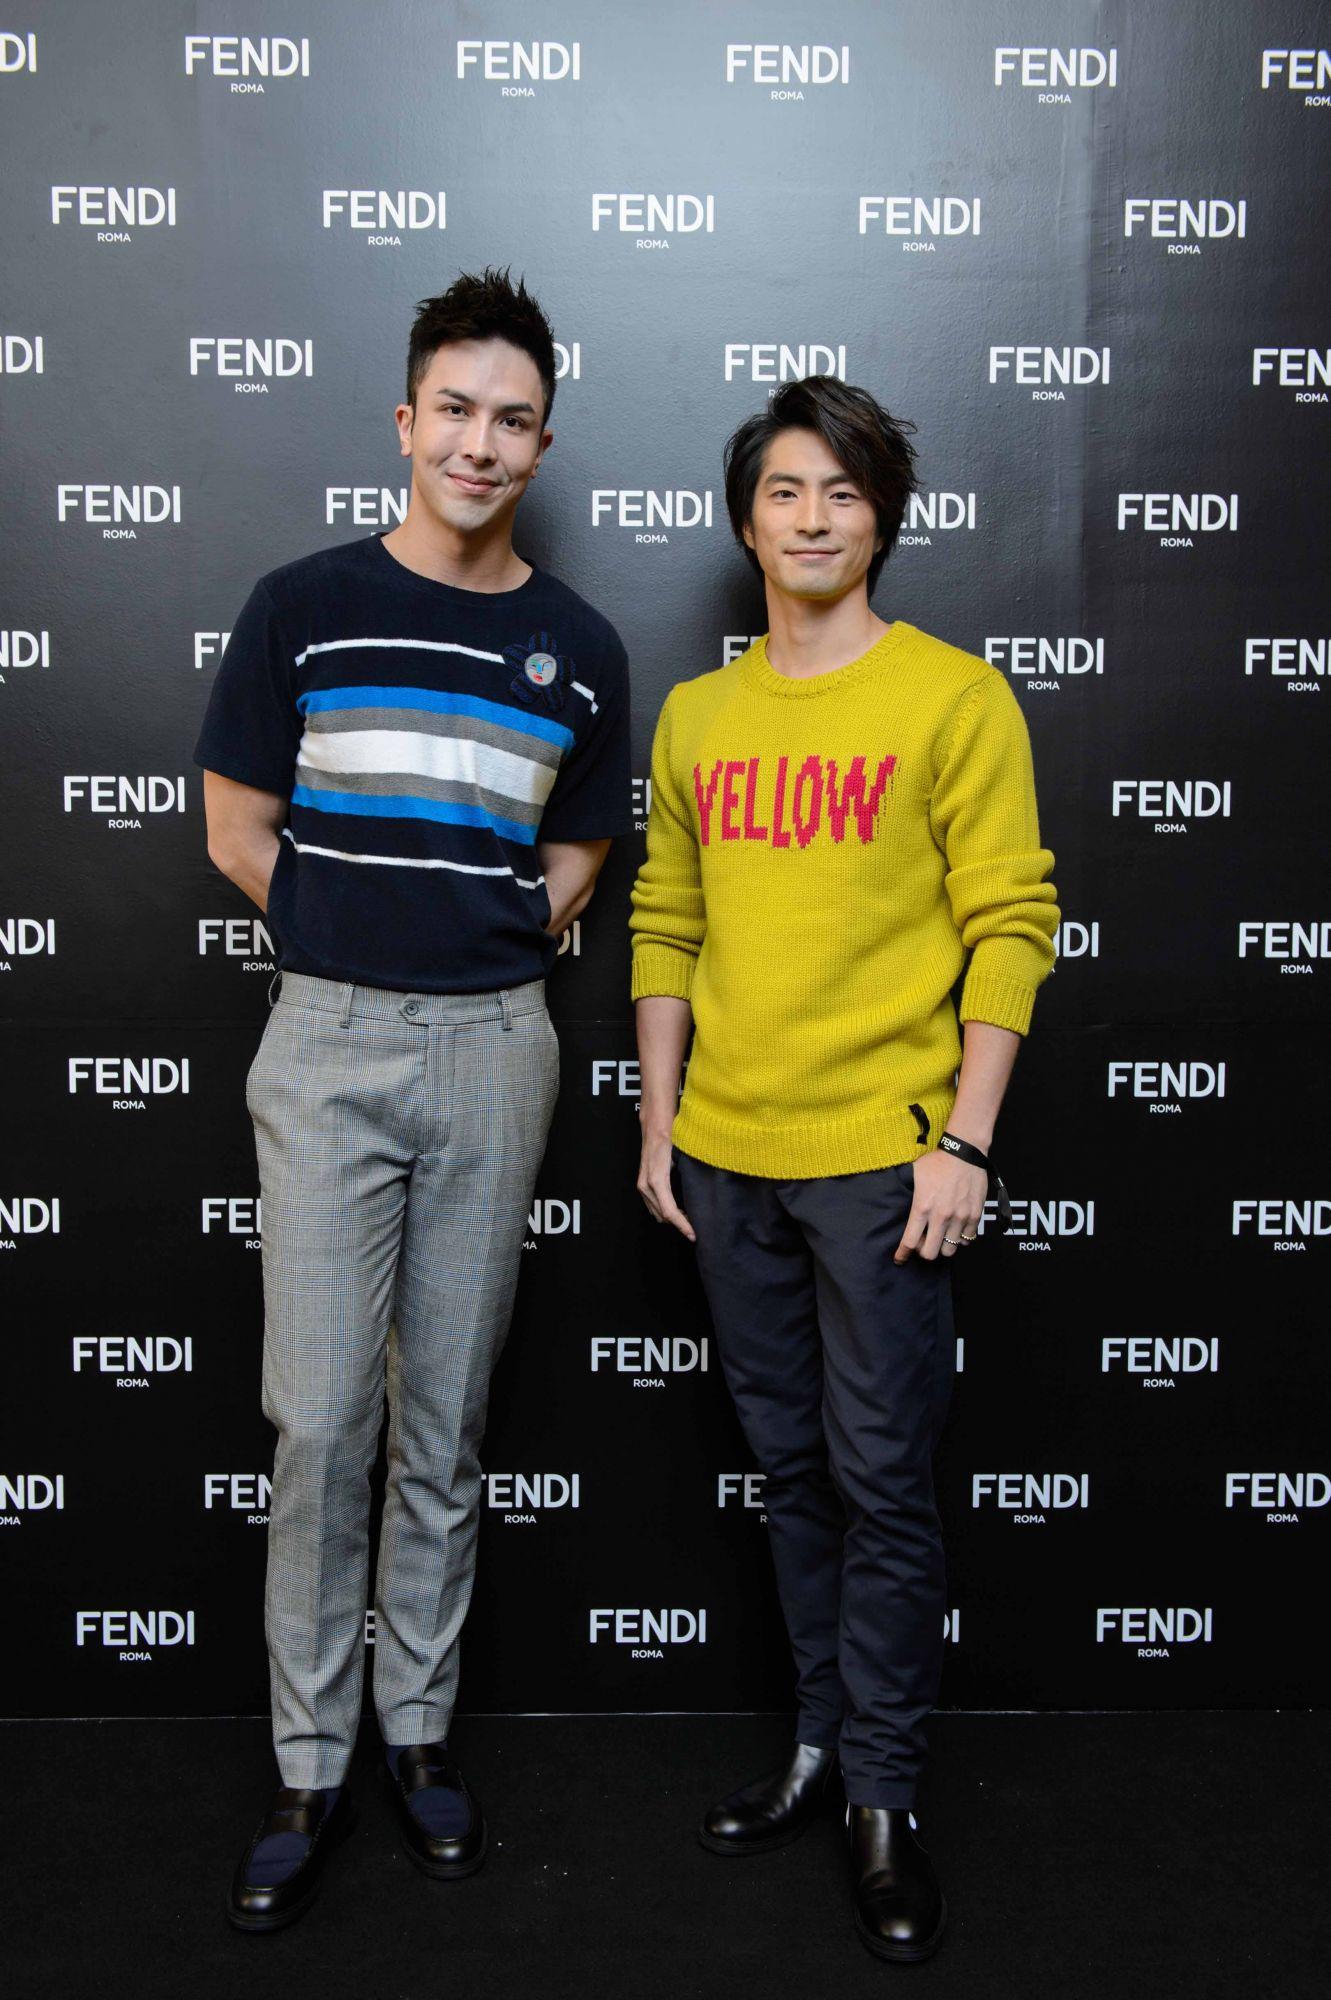 Teddy Tang, Yusuke